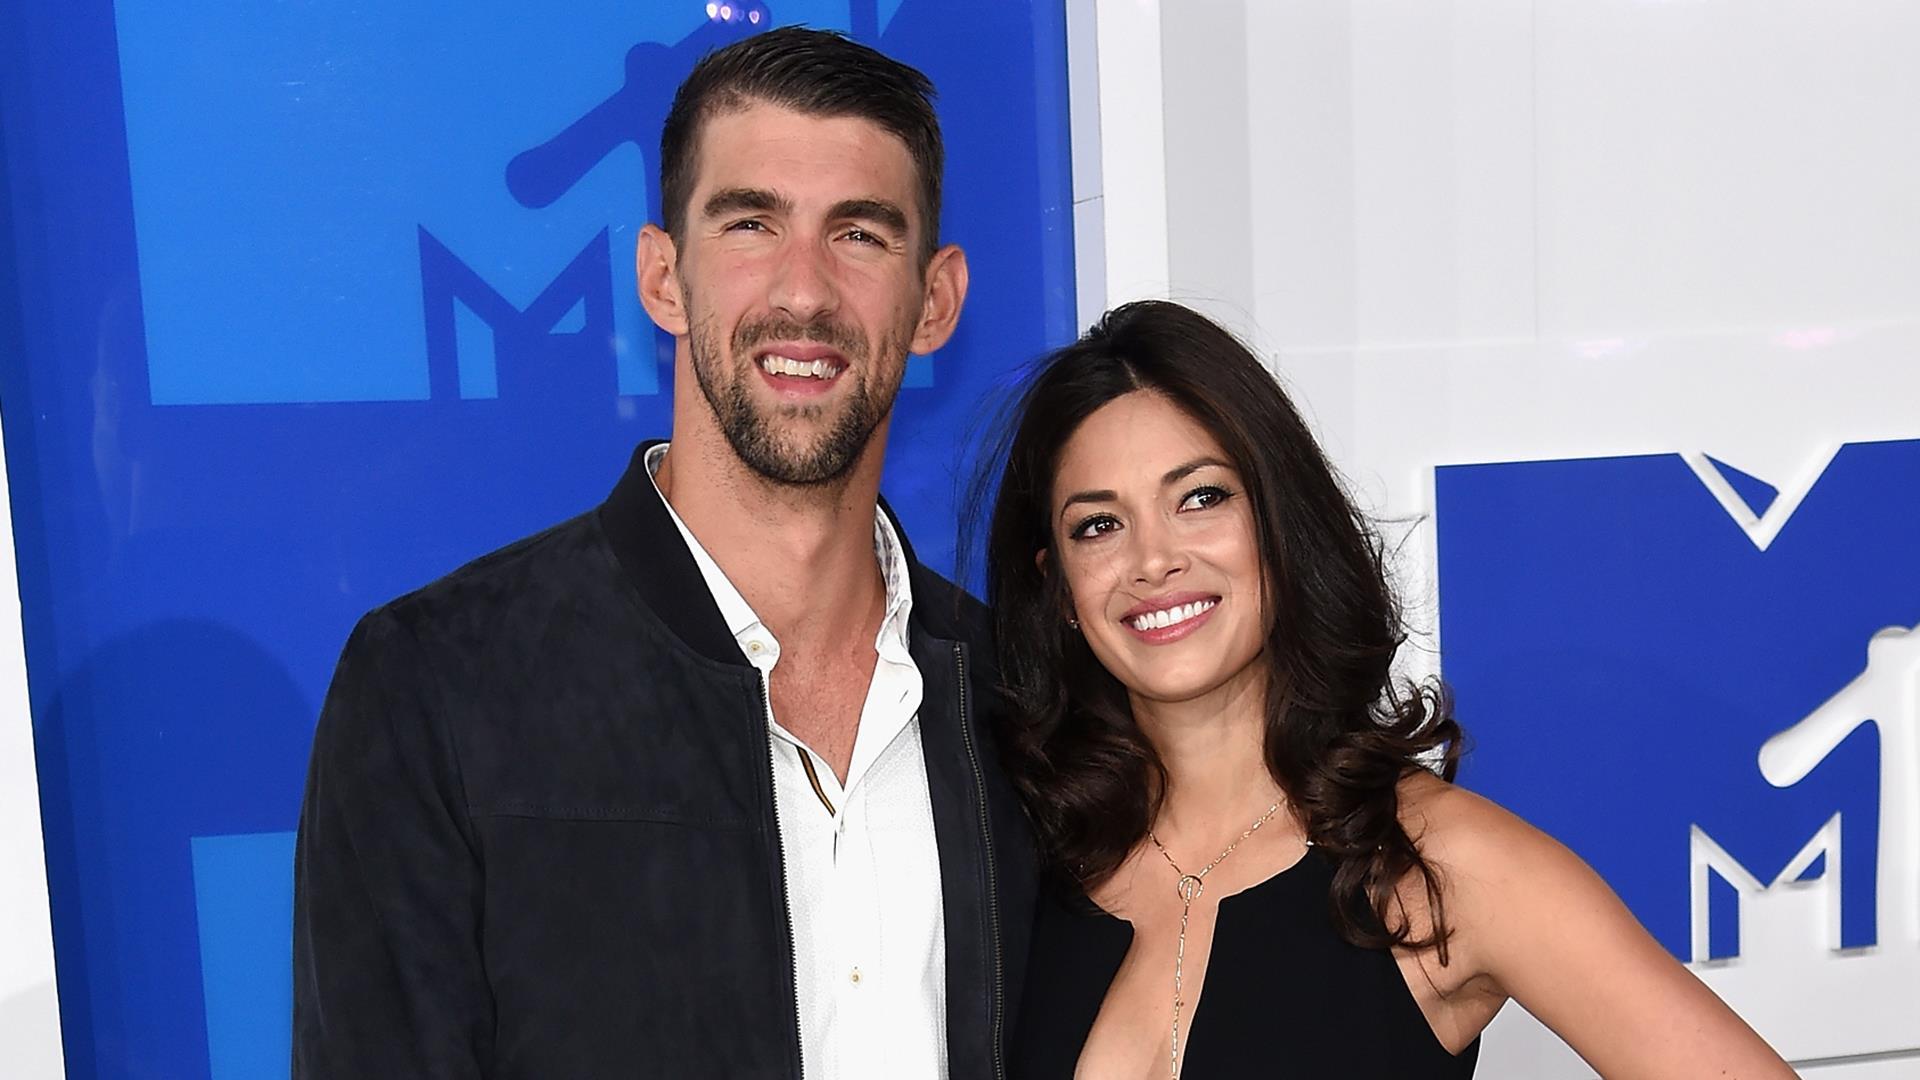 Michael Phelps secretly married Nicole Johnson months ago!